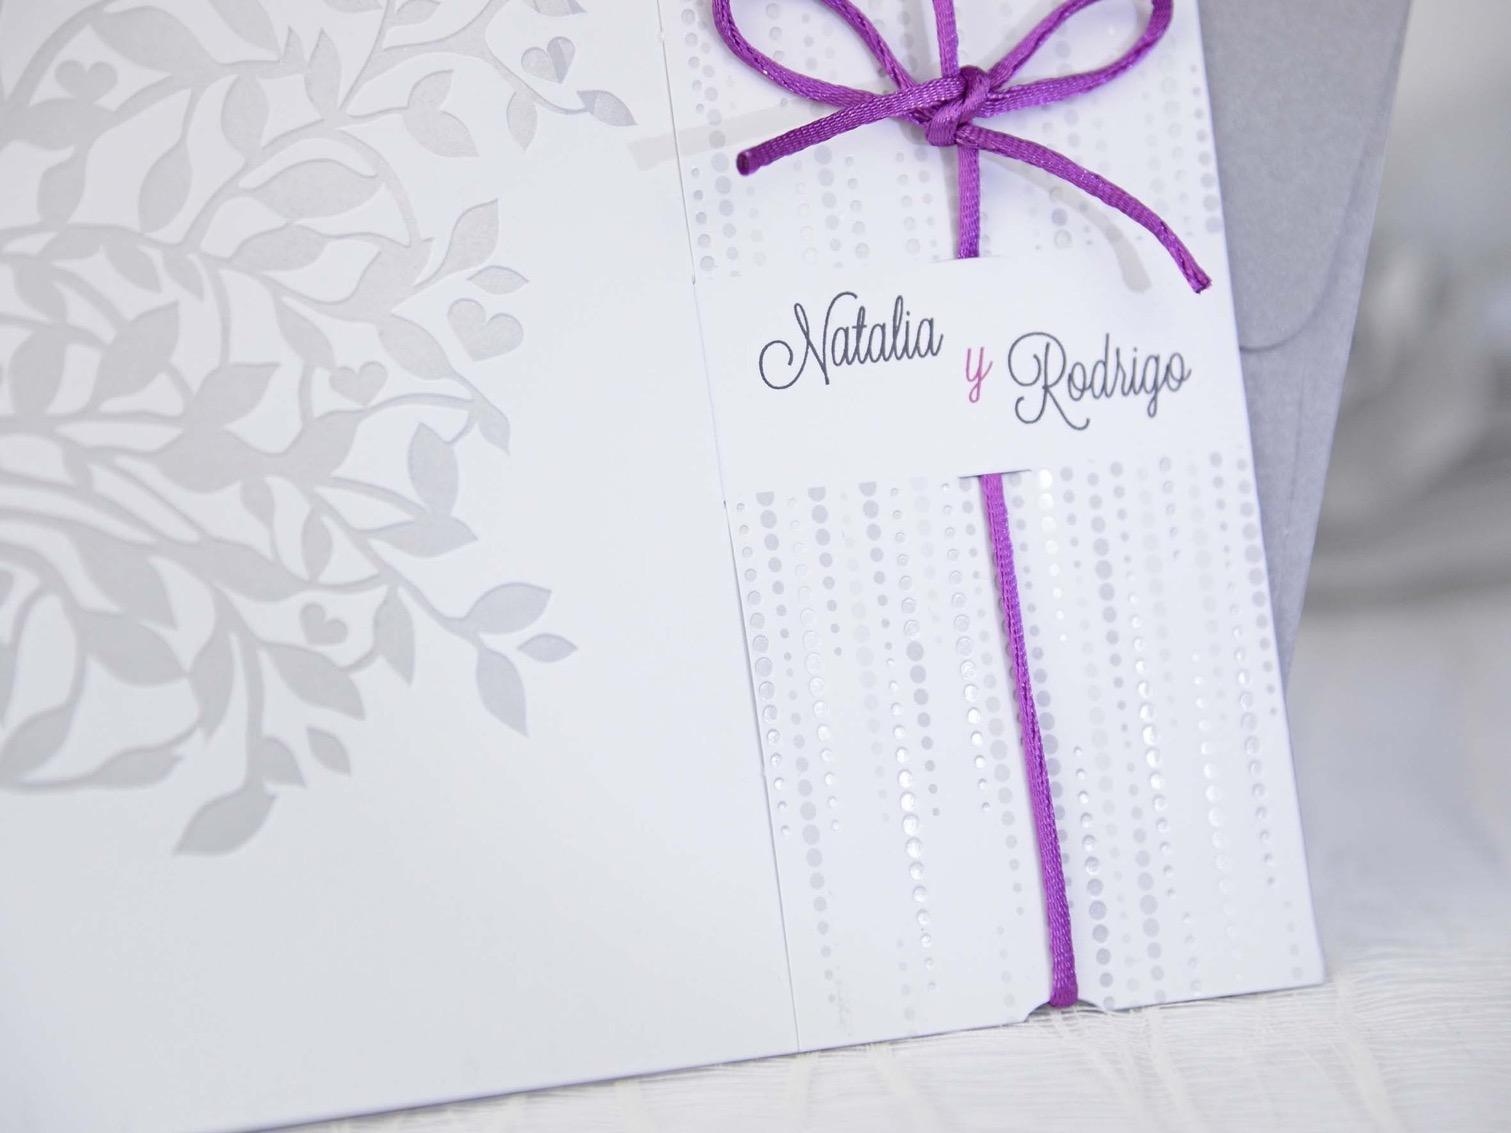 Invitaciones de boda coleccion emma 2020-2021 imprenta dimension print teruel-154